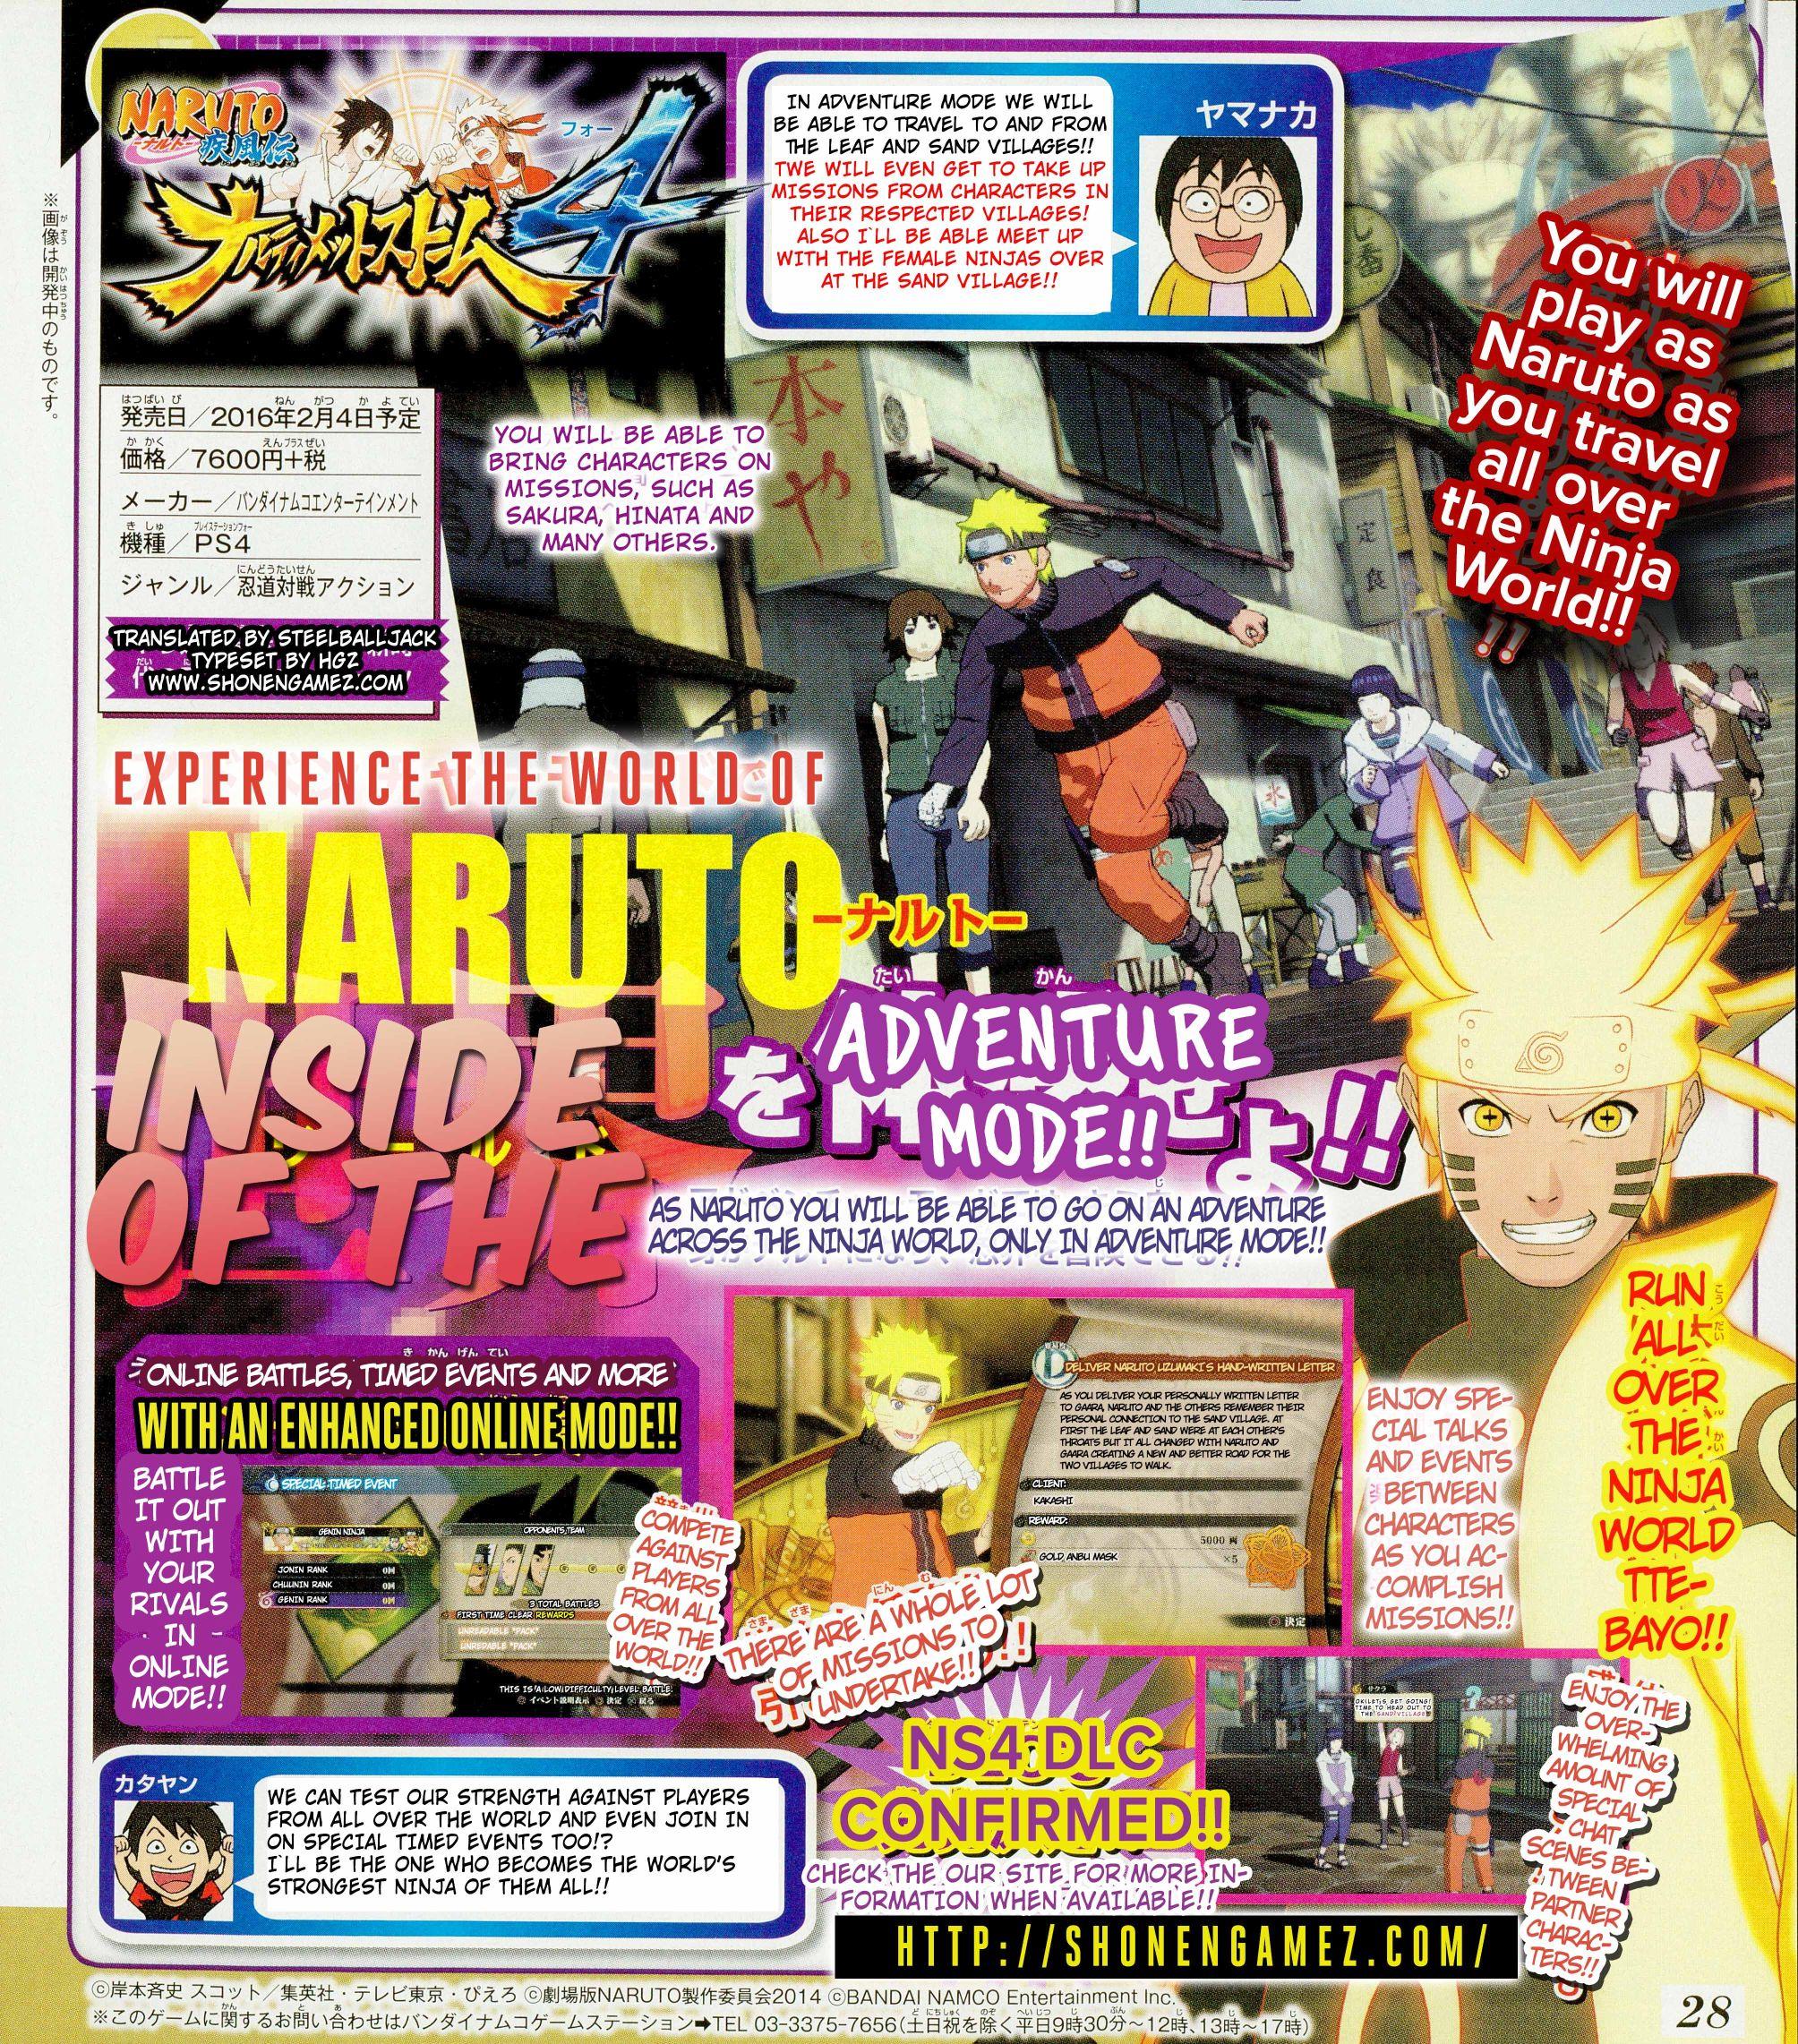 Naruto Shippuden: Ultimate Ninja Storm 4 details Adventure Mode